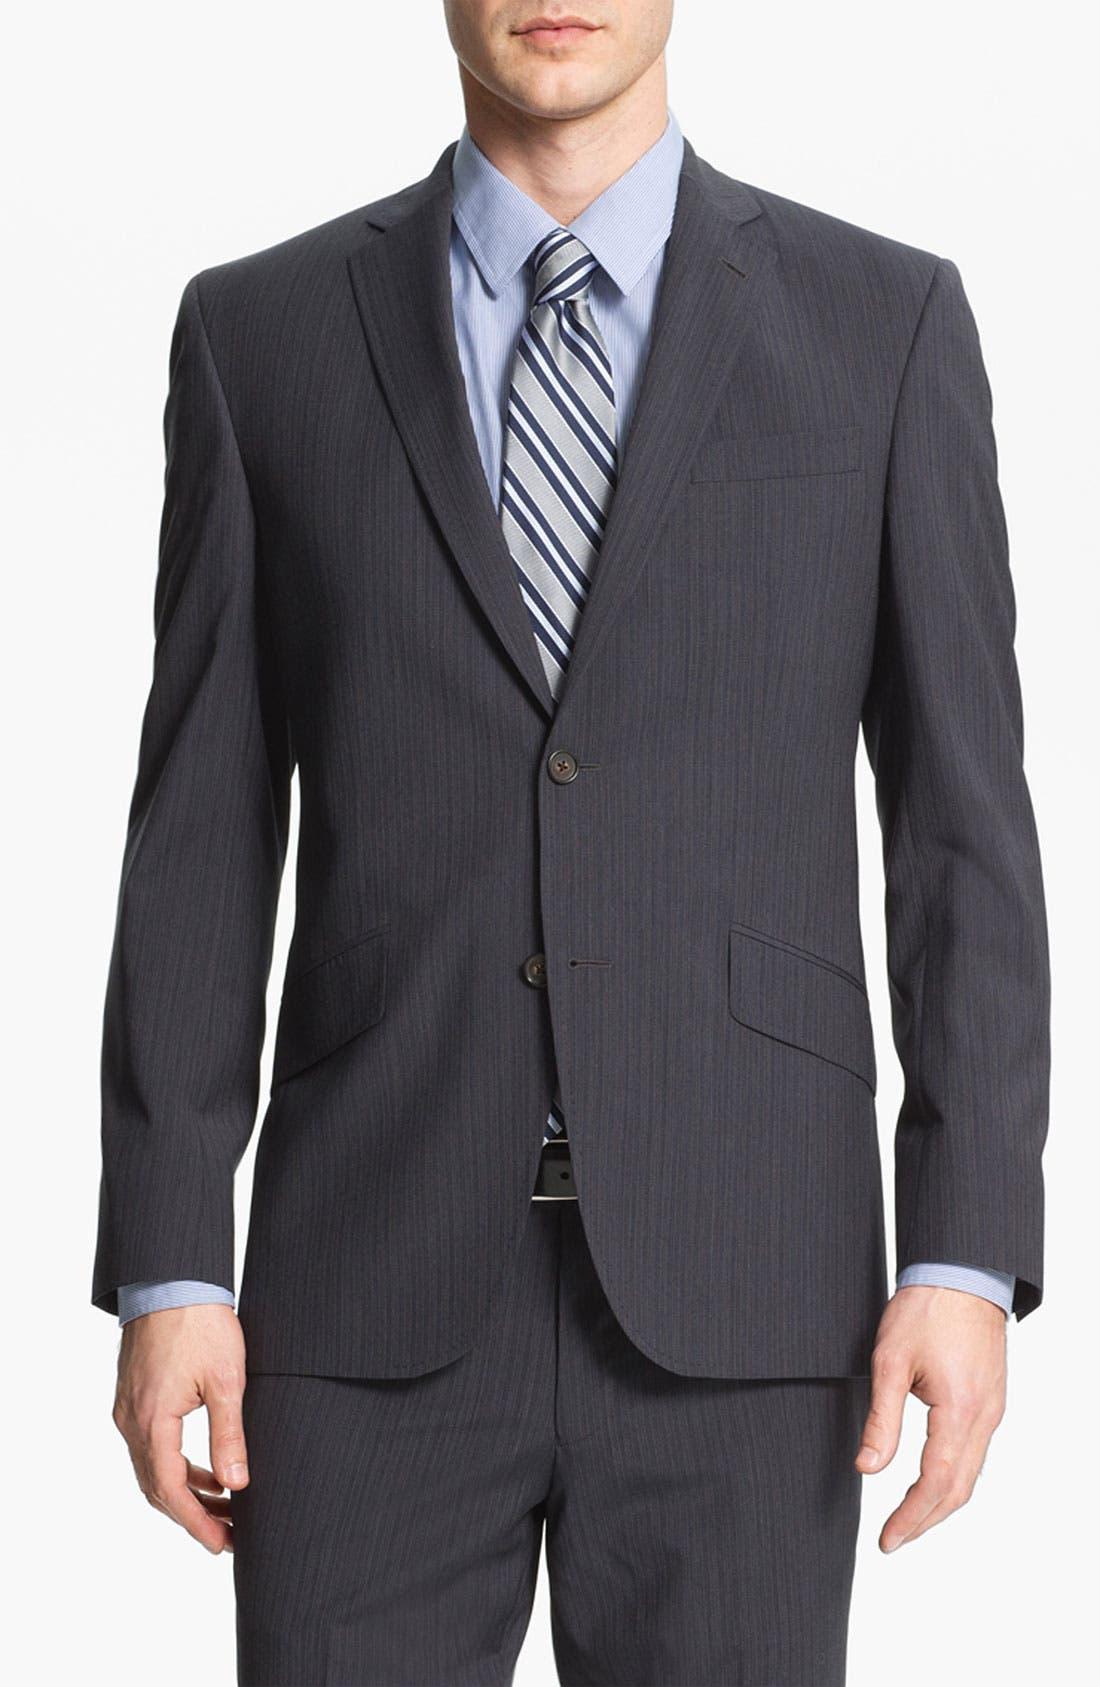 Alternate Image 1 Selected - Ted Baker London Trim Fit Stripe Suit